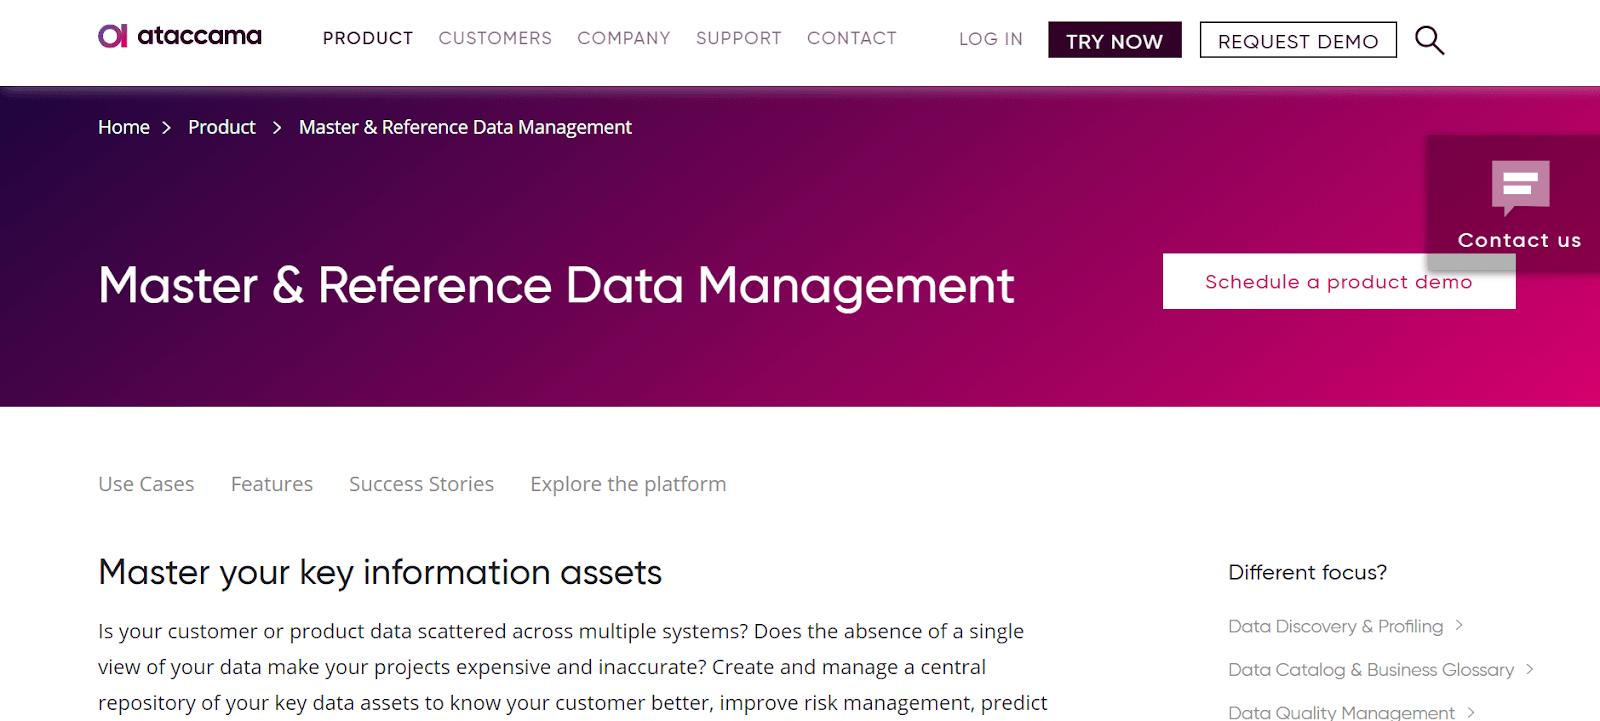 Ataccama Data Management Tool